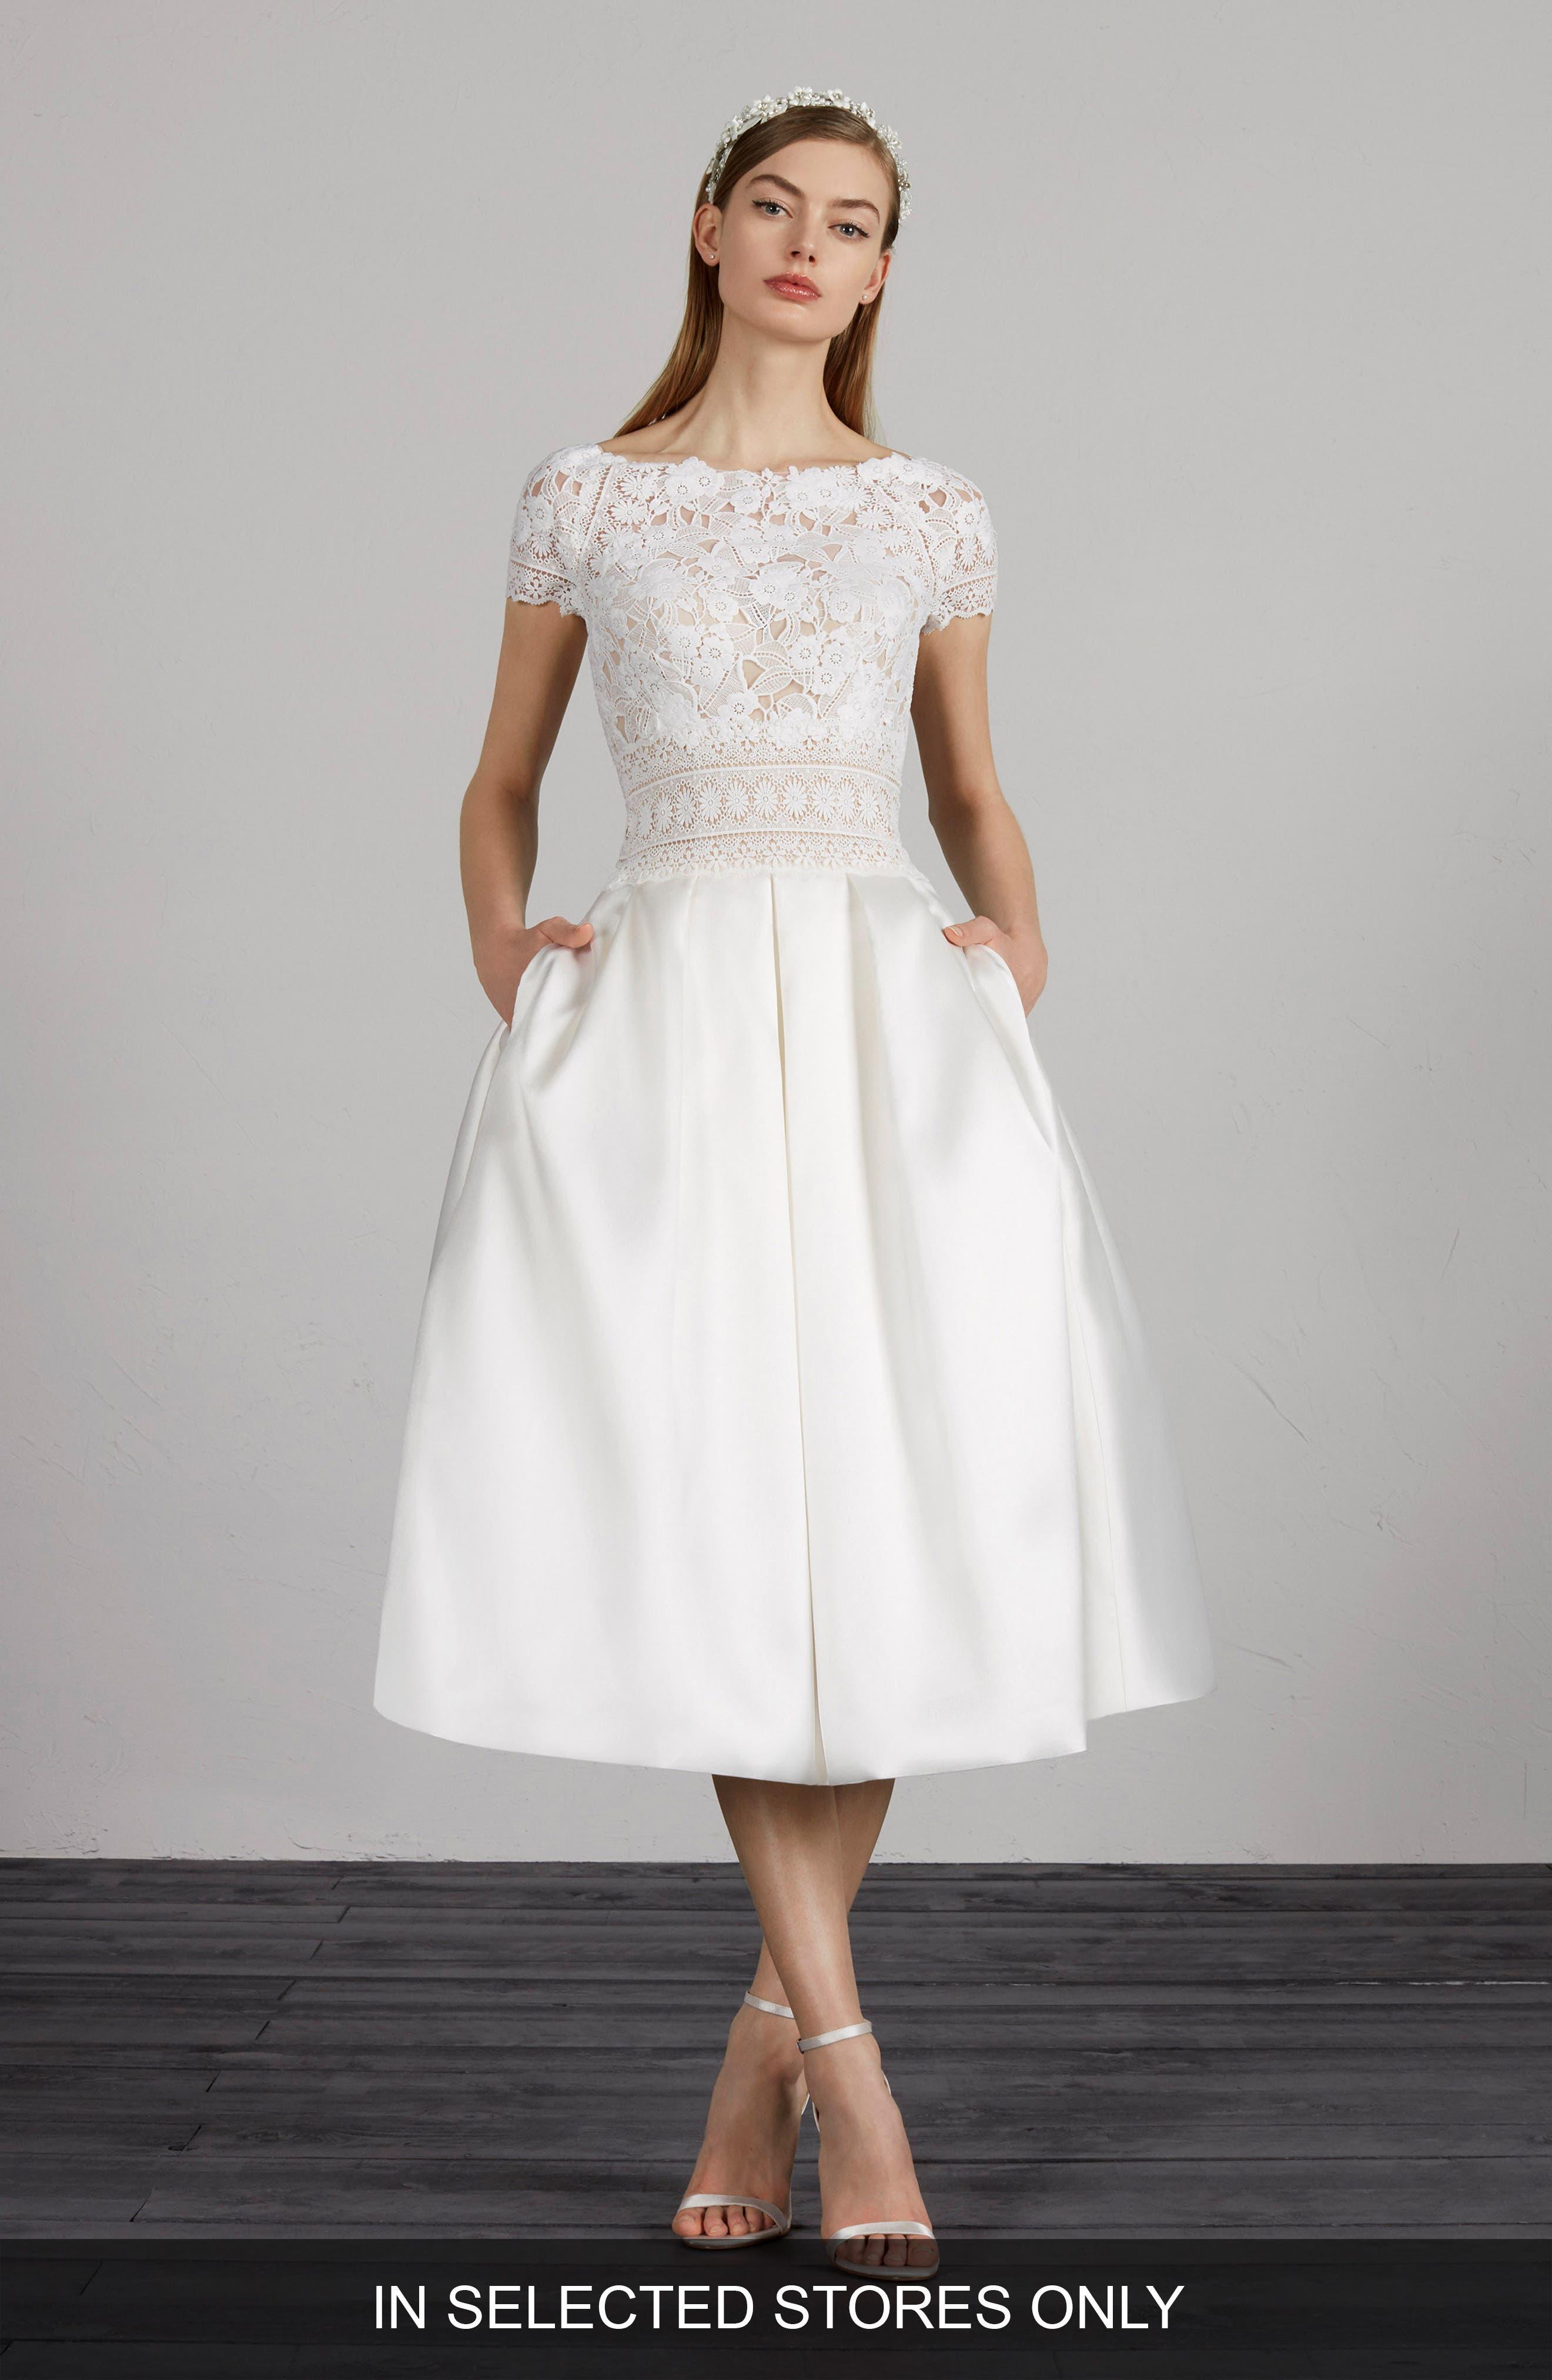 Pronovias Miami Lace & Mikado Tea Length Dress